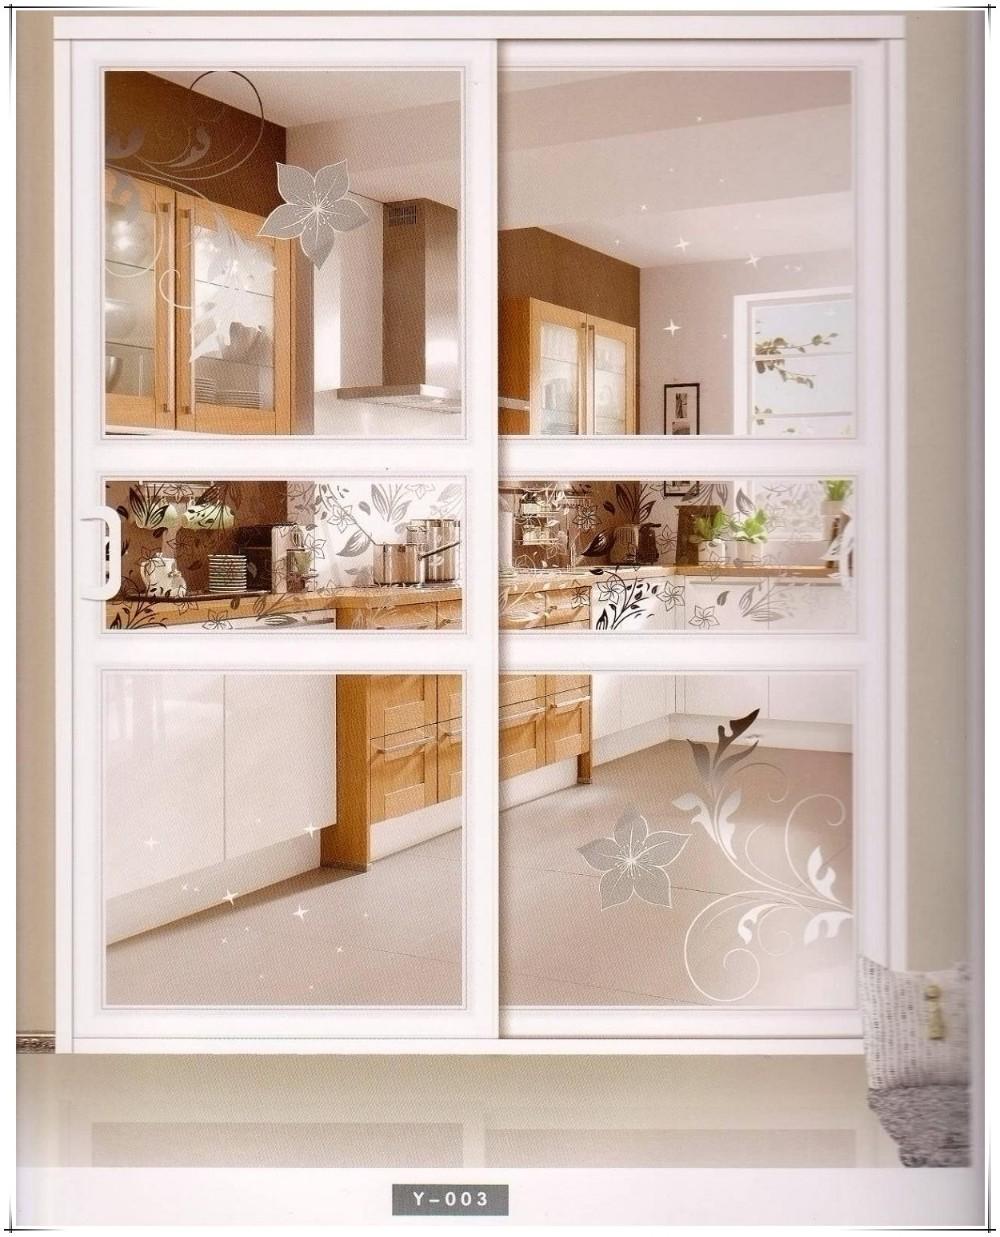 Office Sliding Glass Doors: Frosted Glass Exterior Office Sliding Door